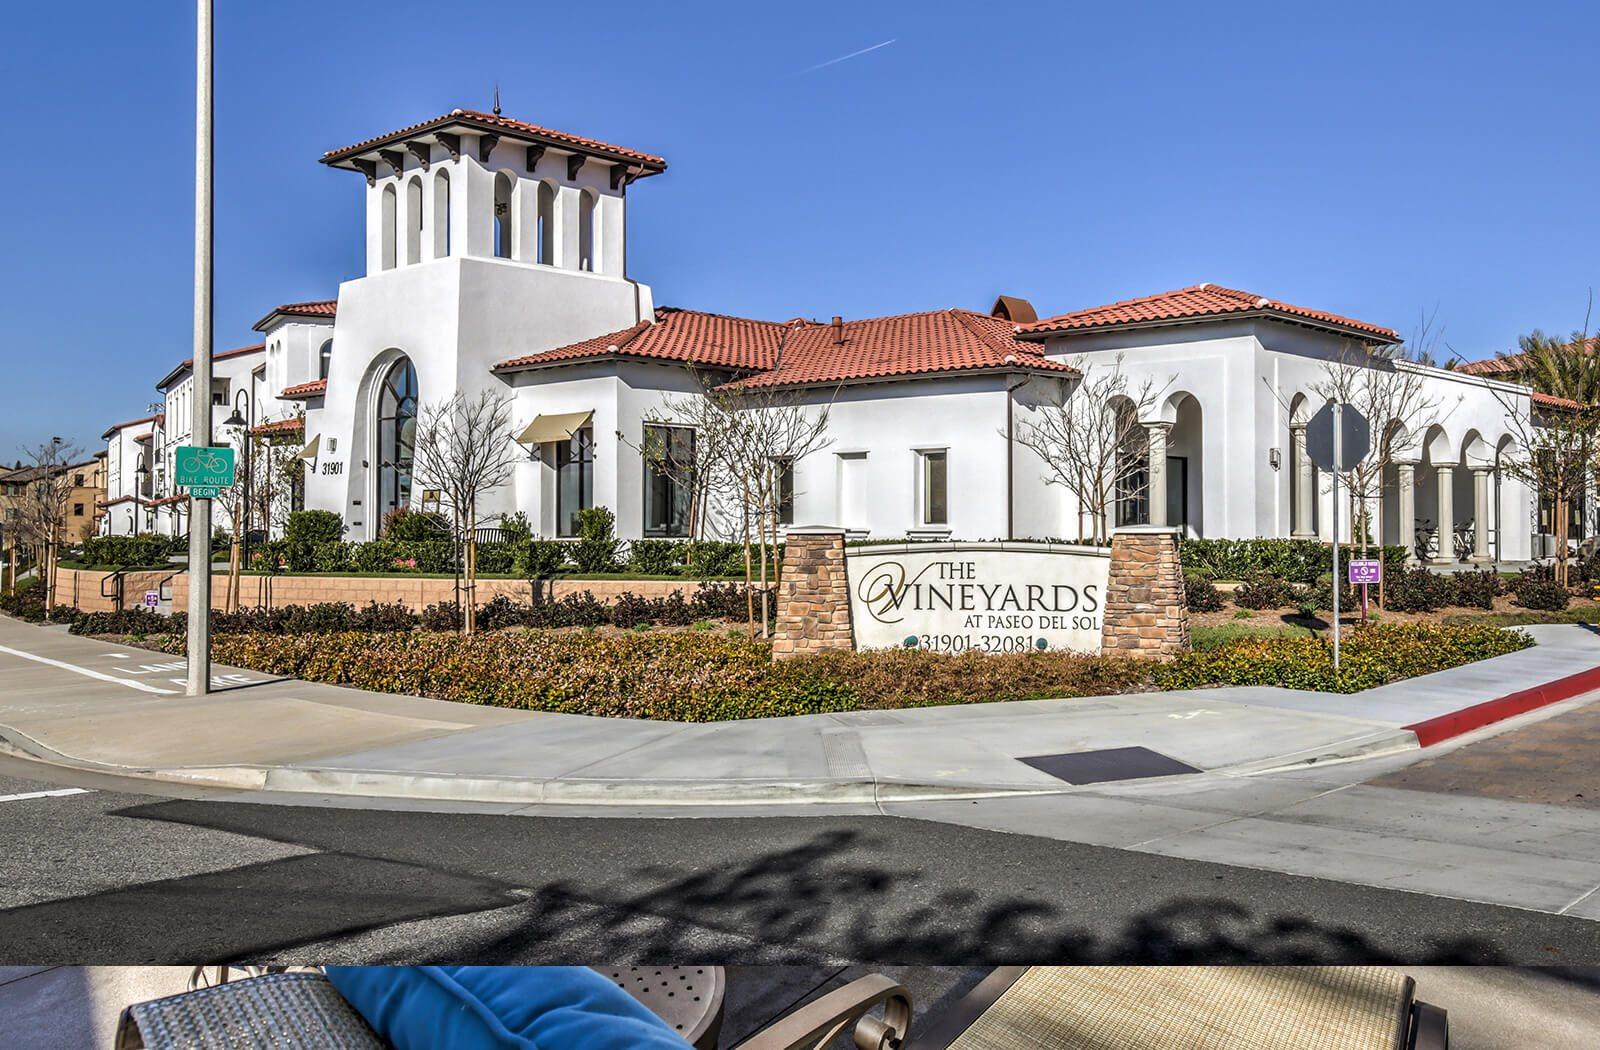 Welcoming Property Signage at The Vineyards at Paseo del Sol, Temecula, CA, 92592